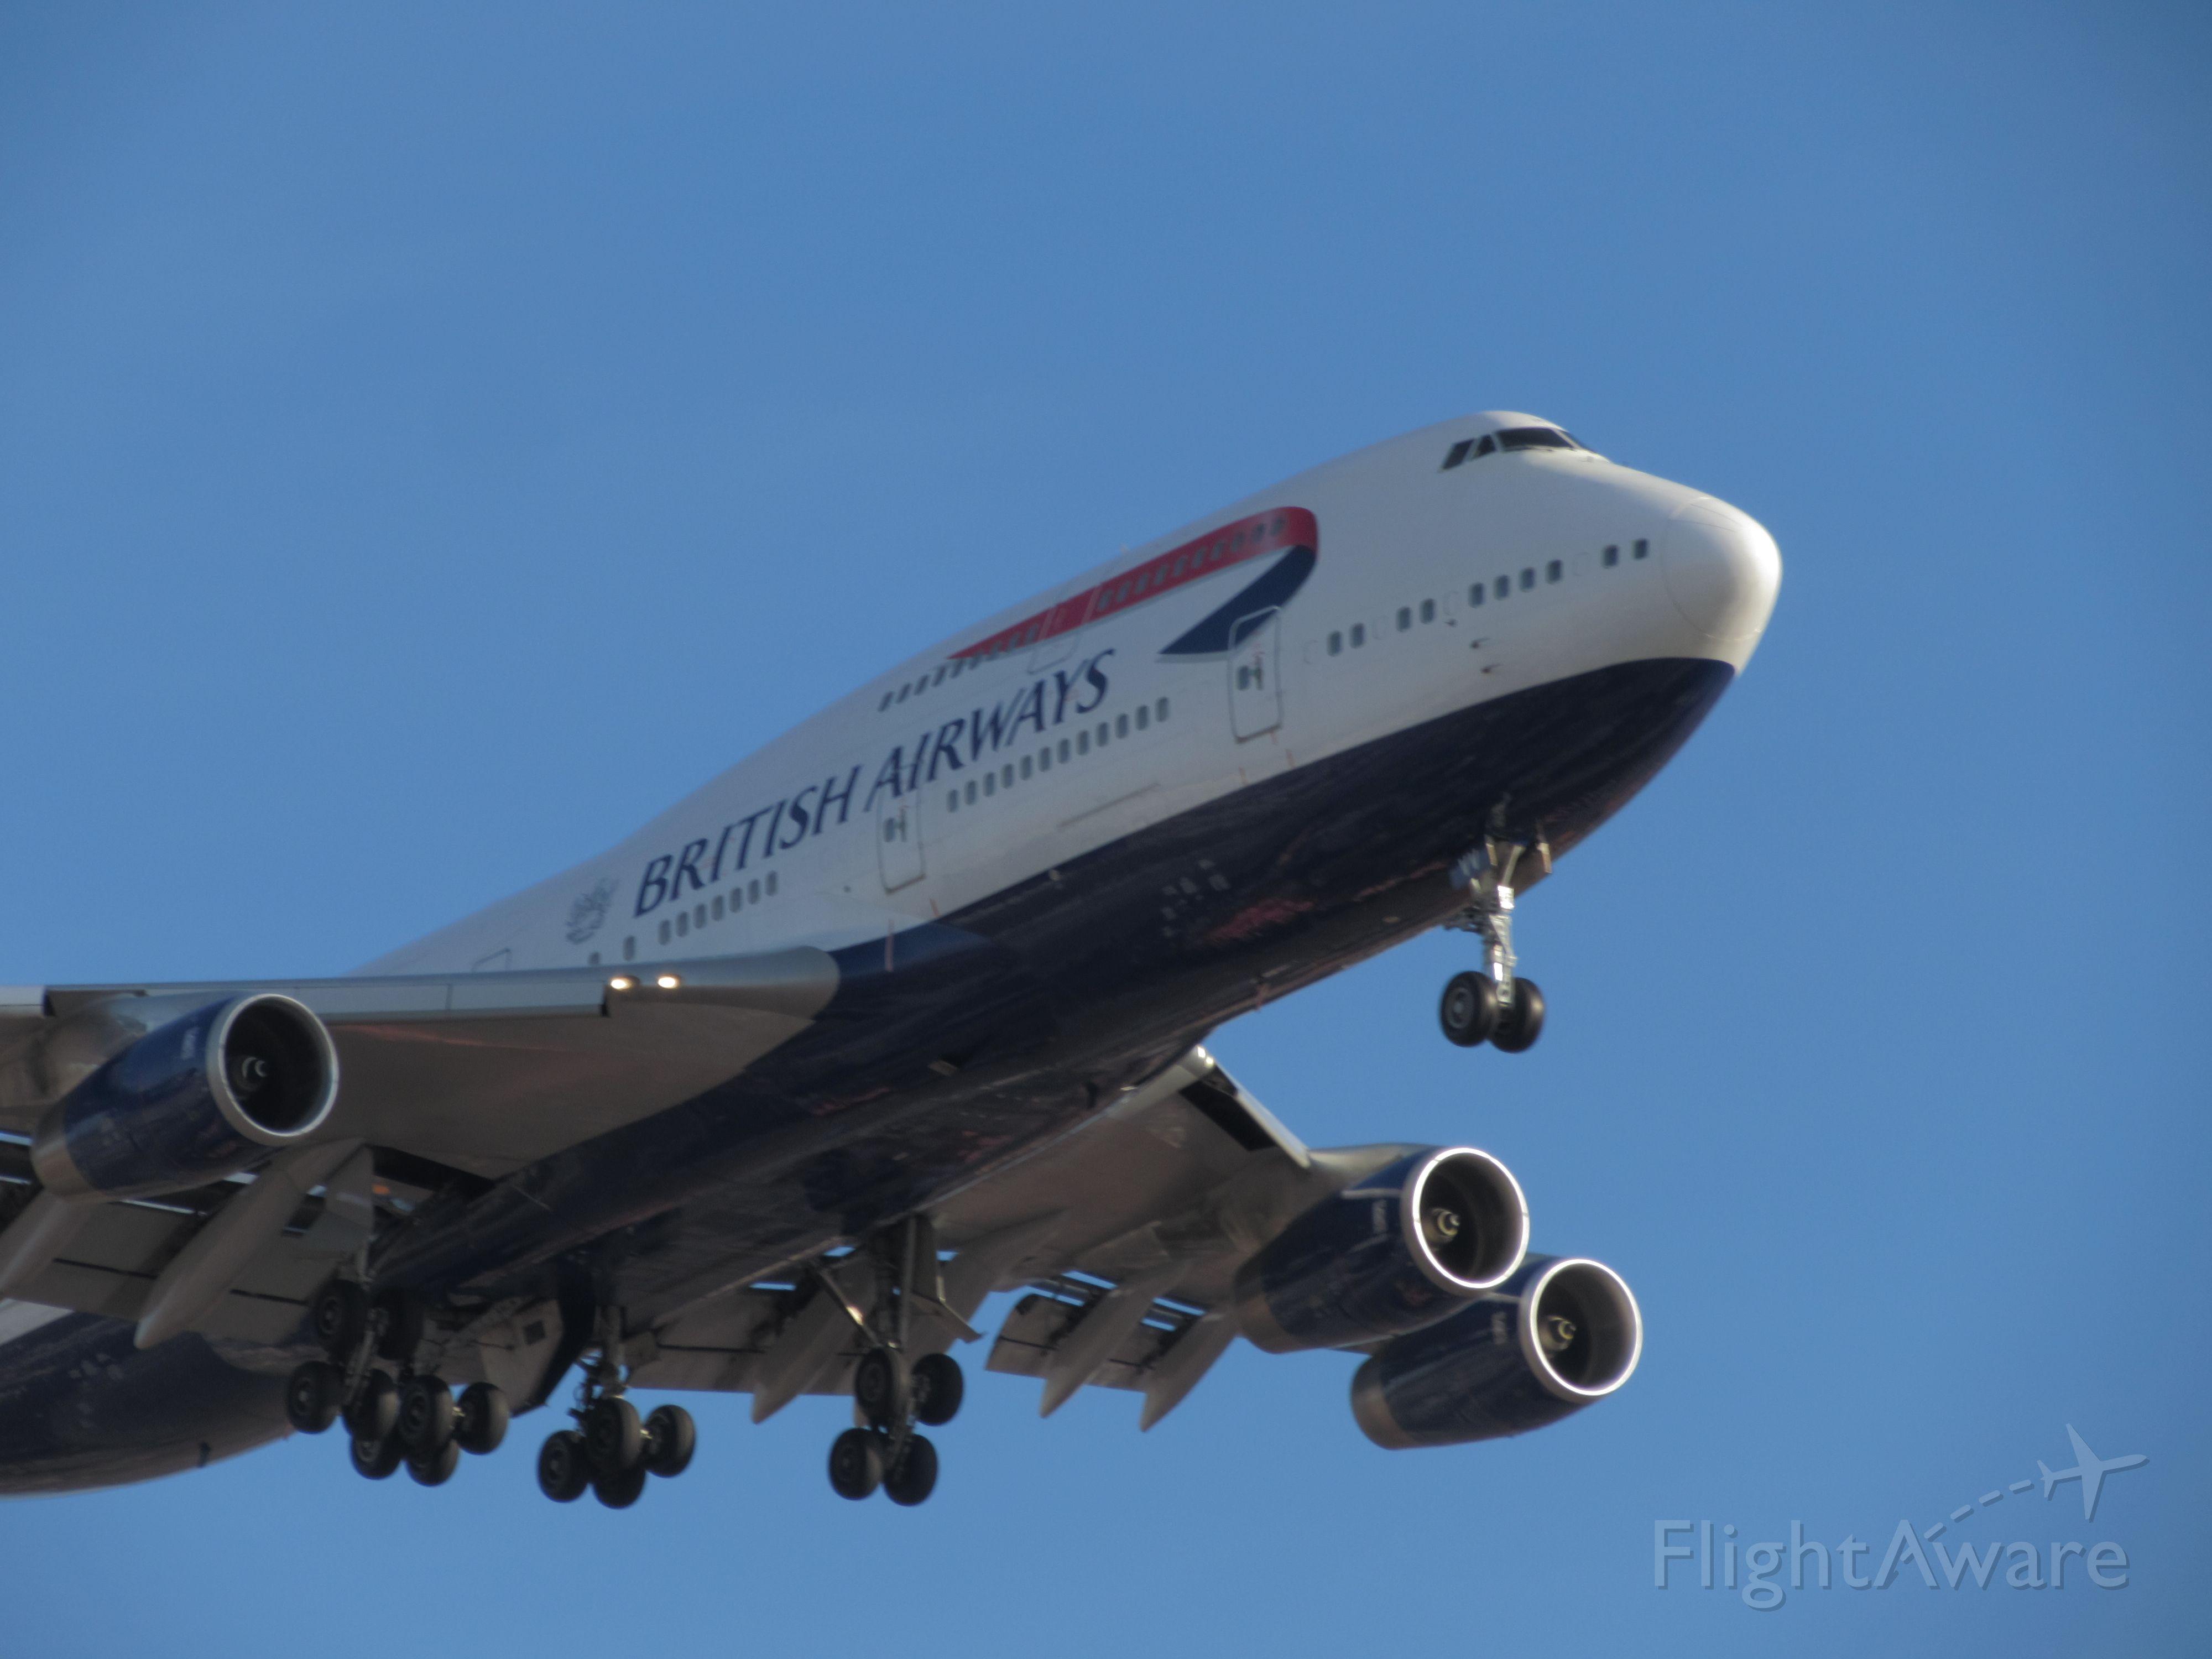 — — - British airways 747-400 at Chicago Ohare